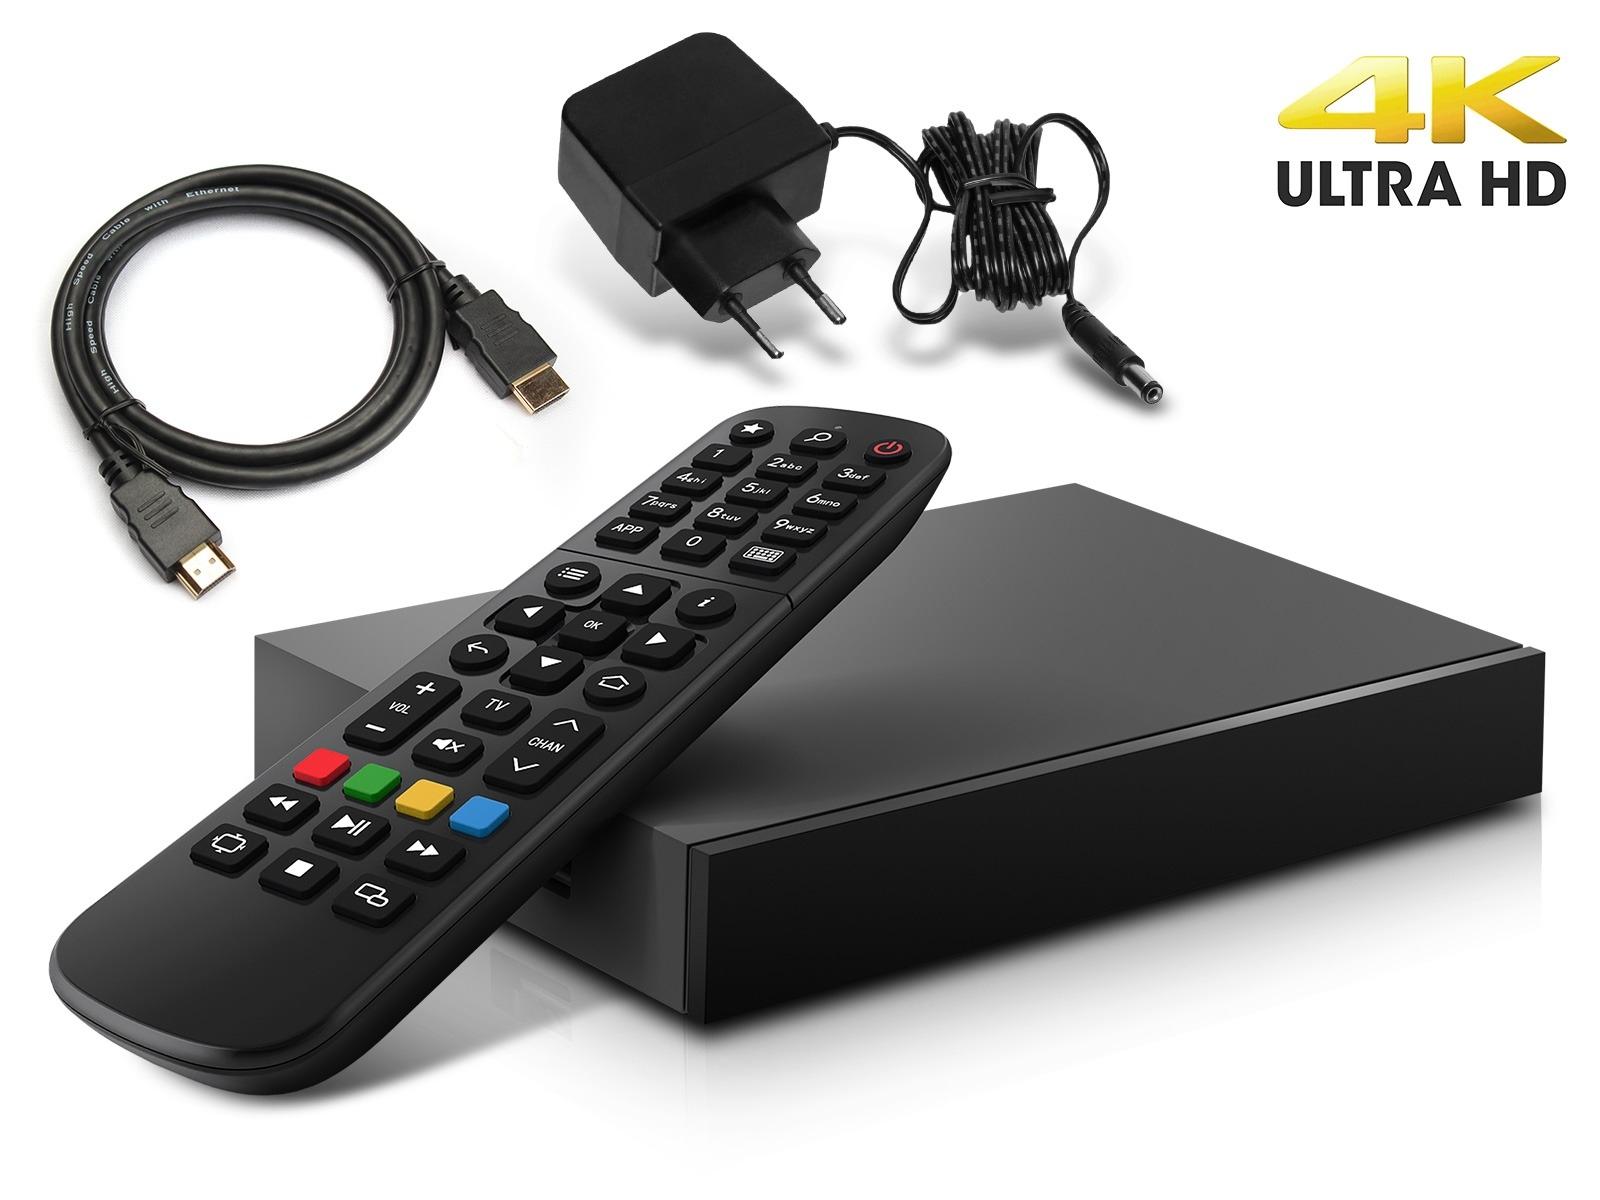 MAG 520 IP TV Internet Streamer HEVC H.265 4K UHD 60FPS Linux USB 3.0 LAN HDMI